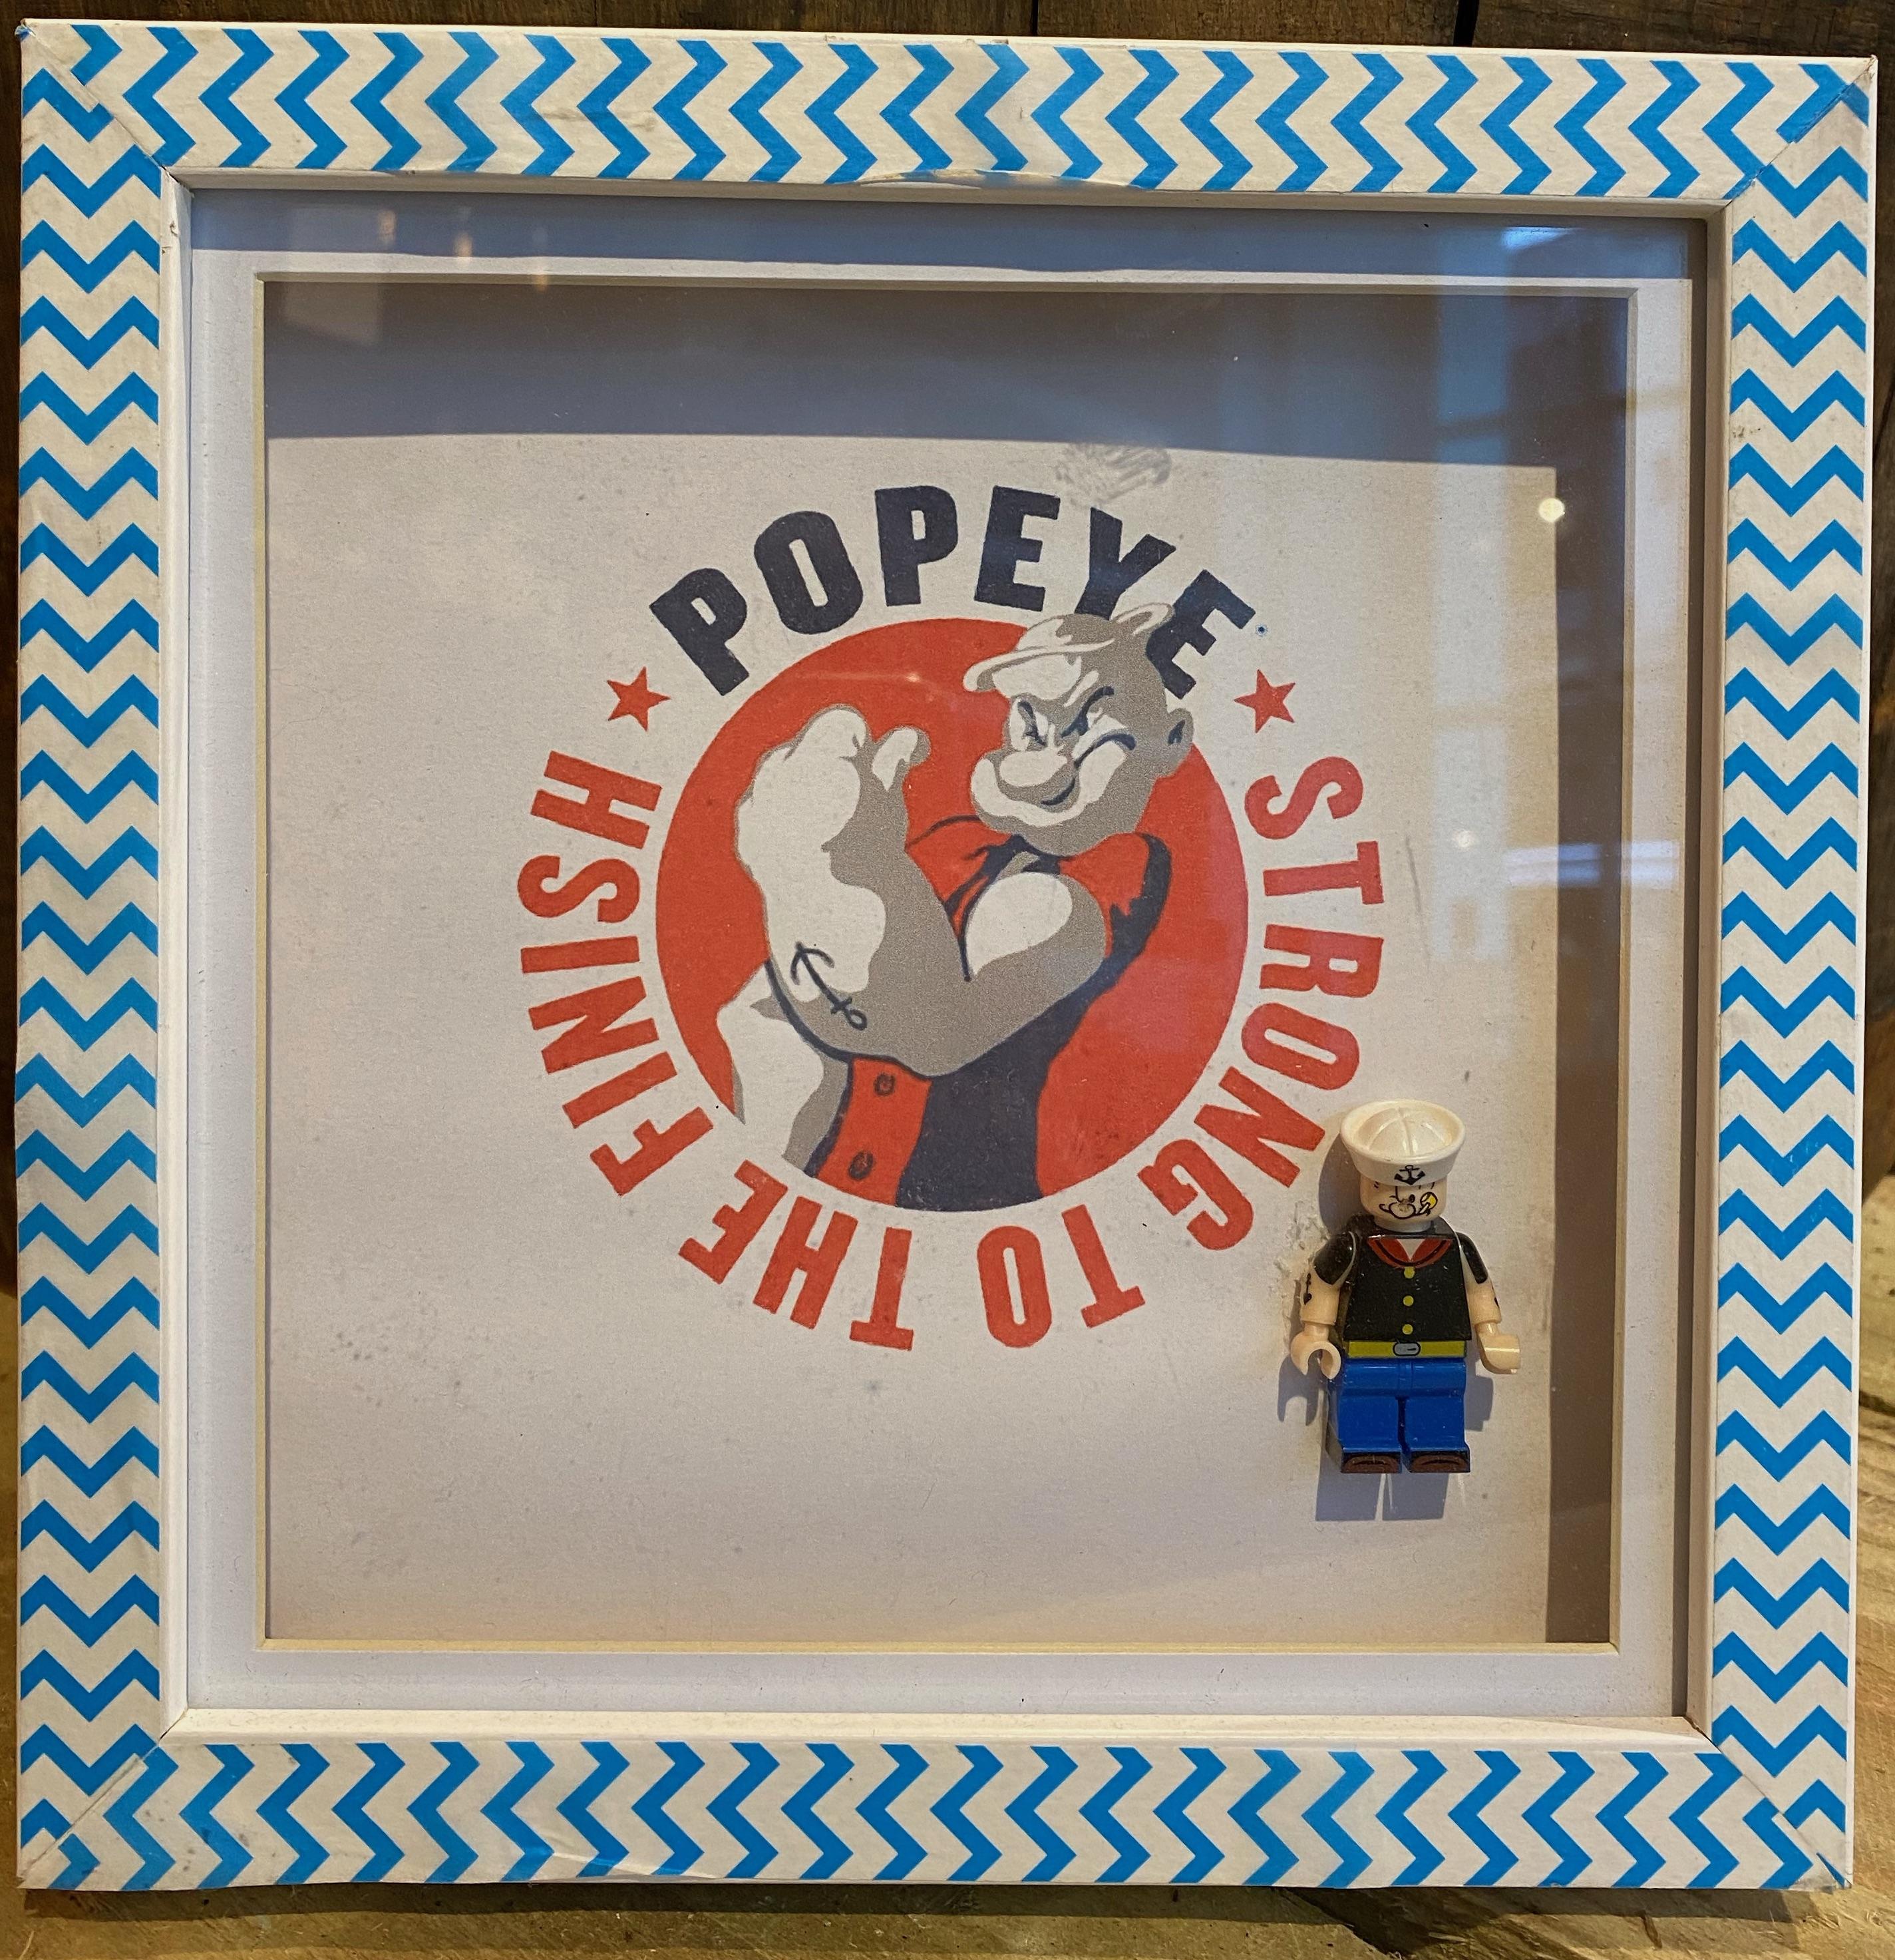 Lego Art - Popeye